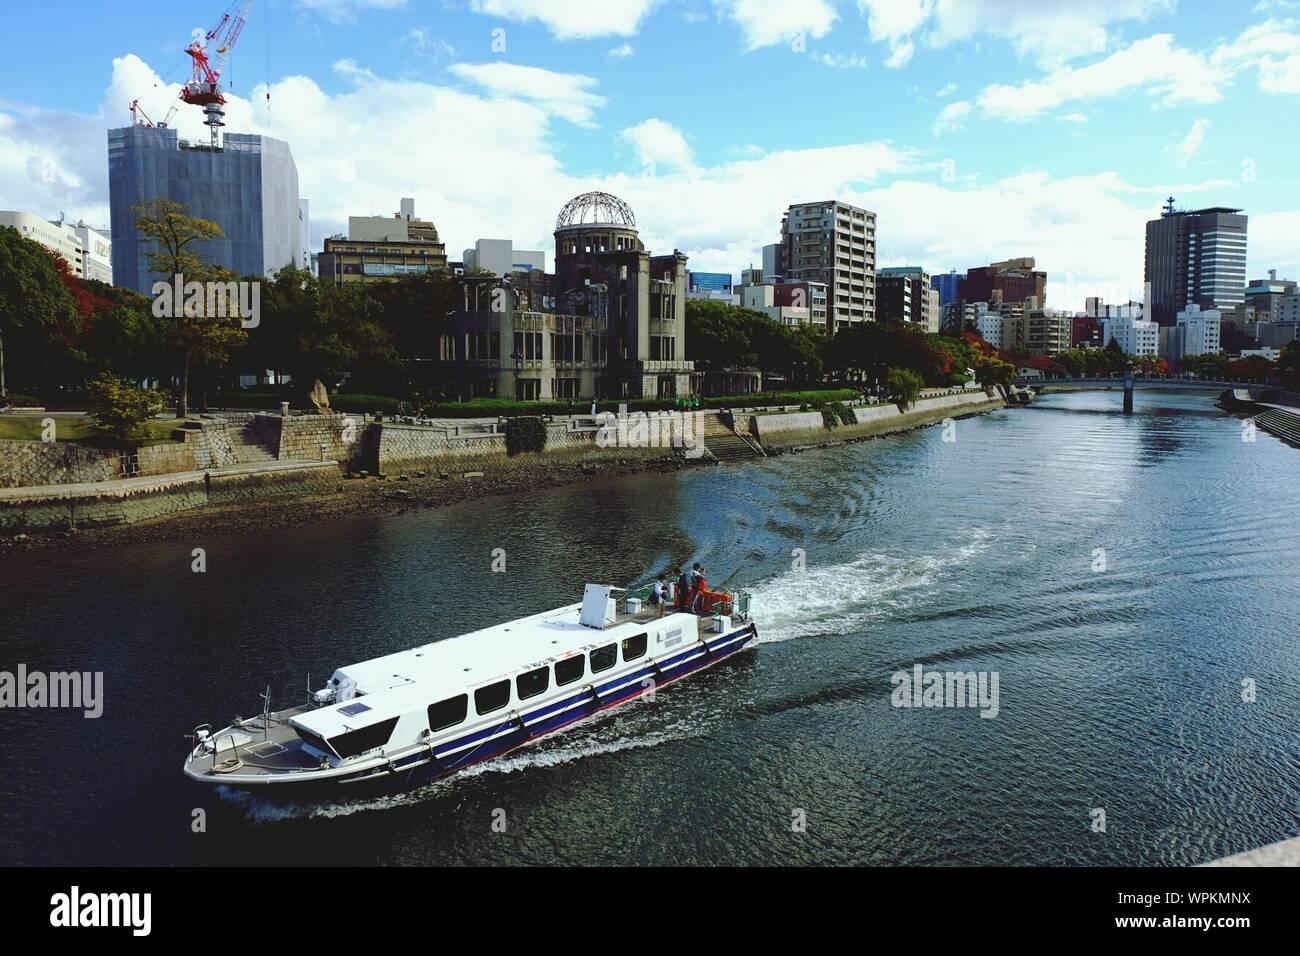 Fähre in Ota-Fluss mit Hiroshima Peace Memorial in der Stadt Stockfoto